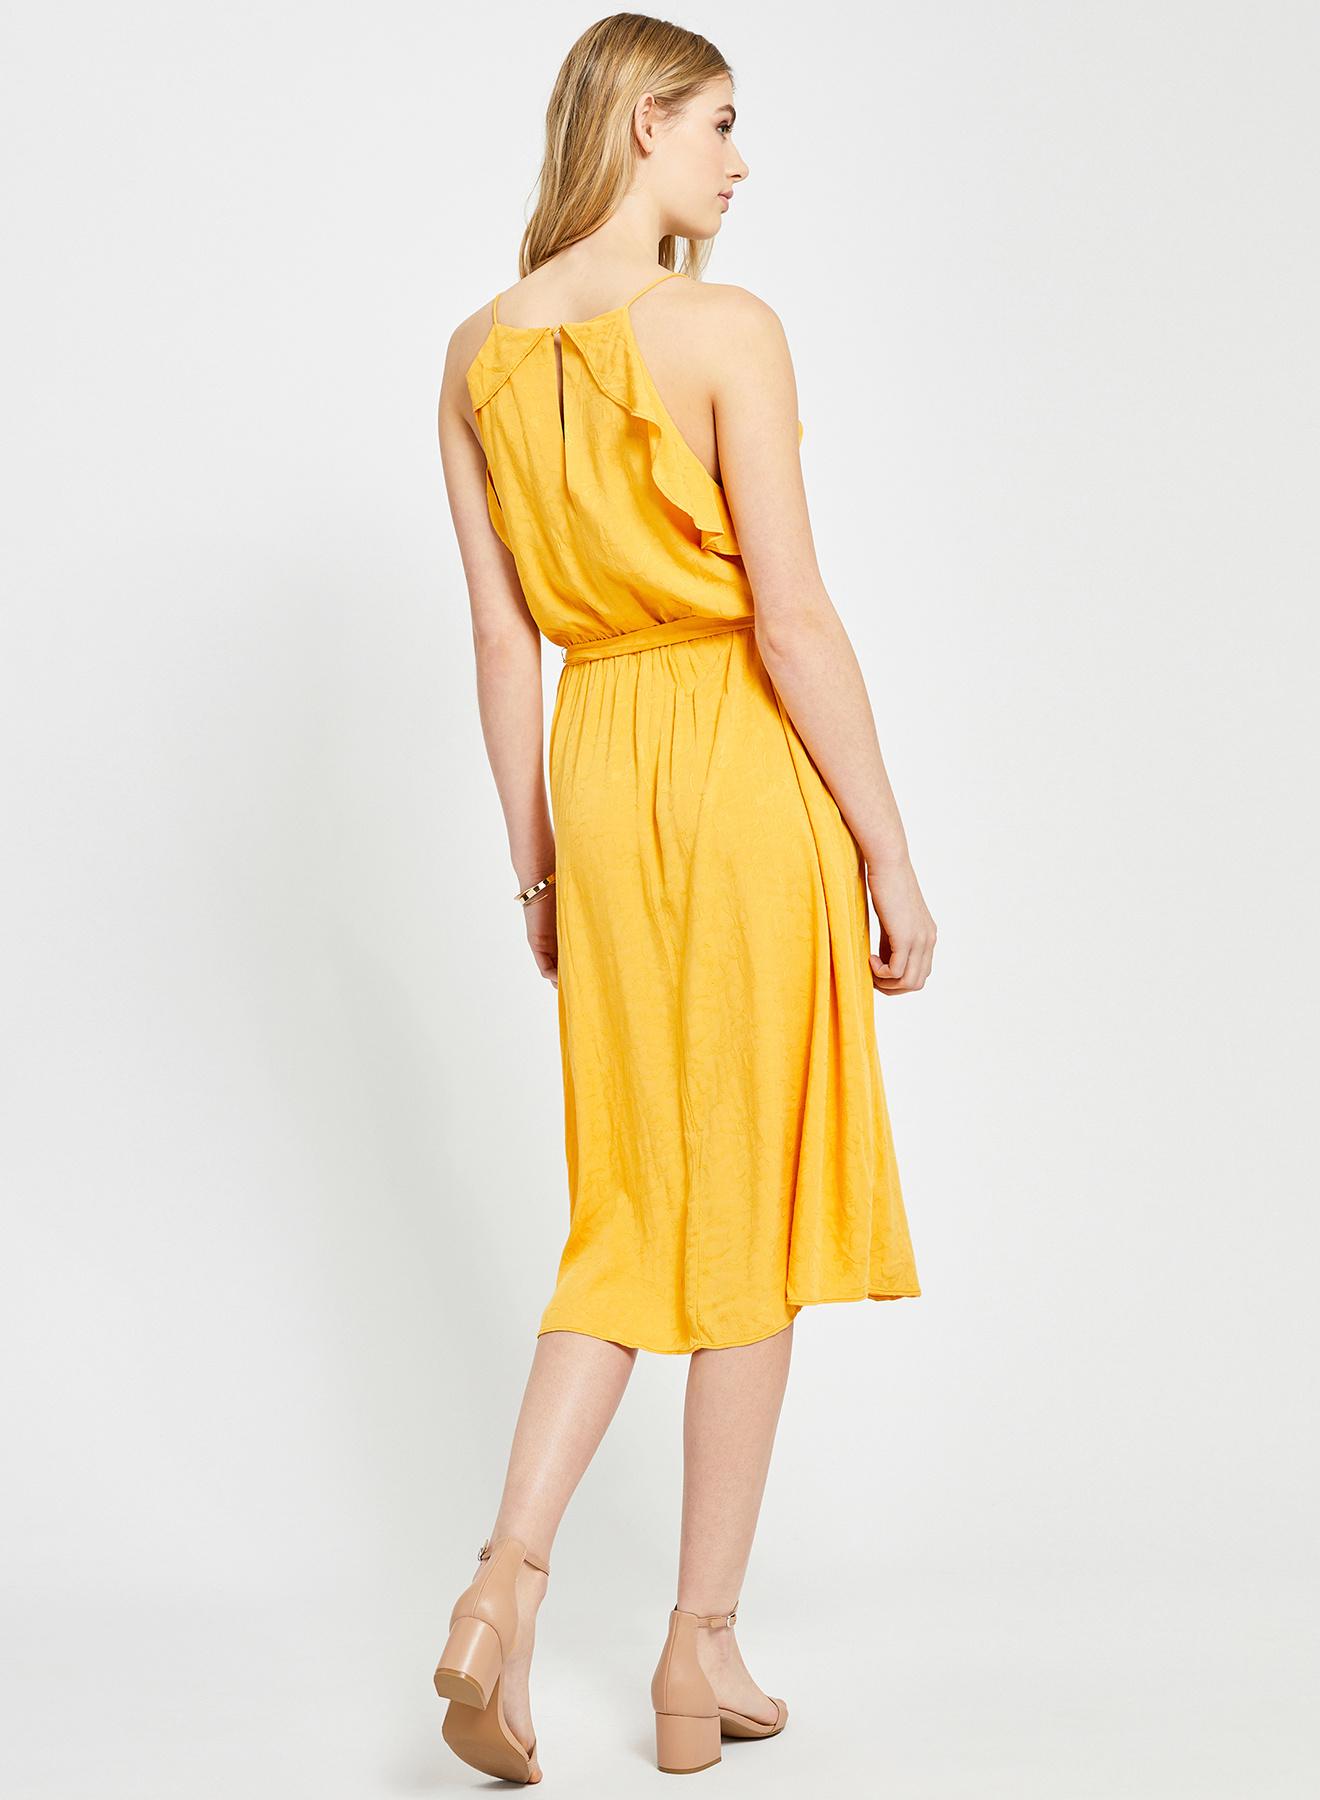 Gentlefawn Genevieve Dress